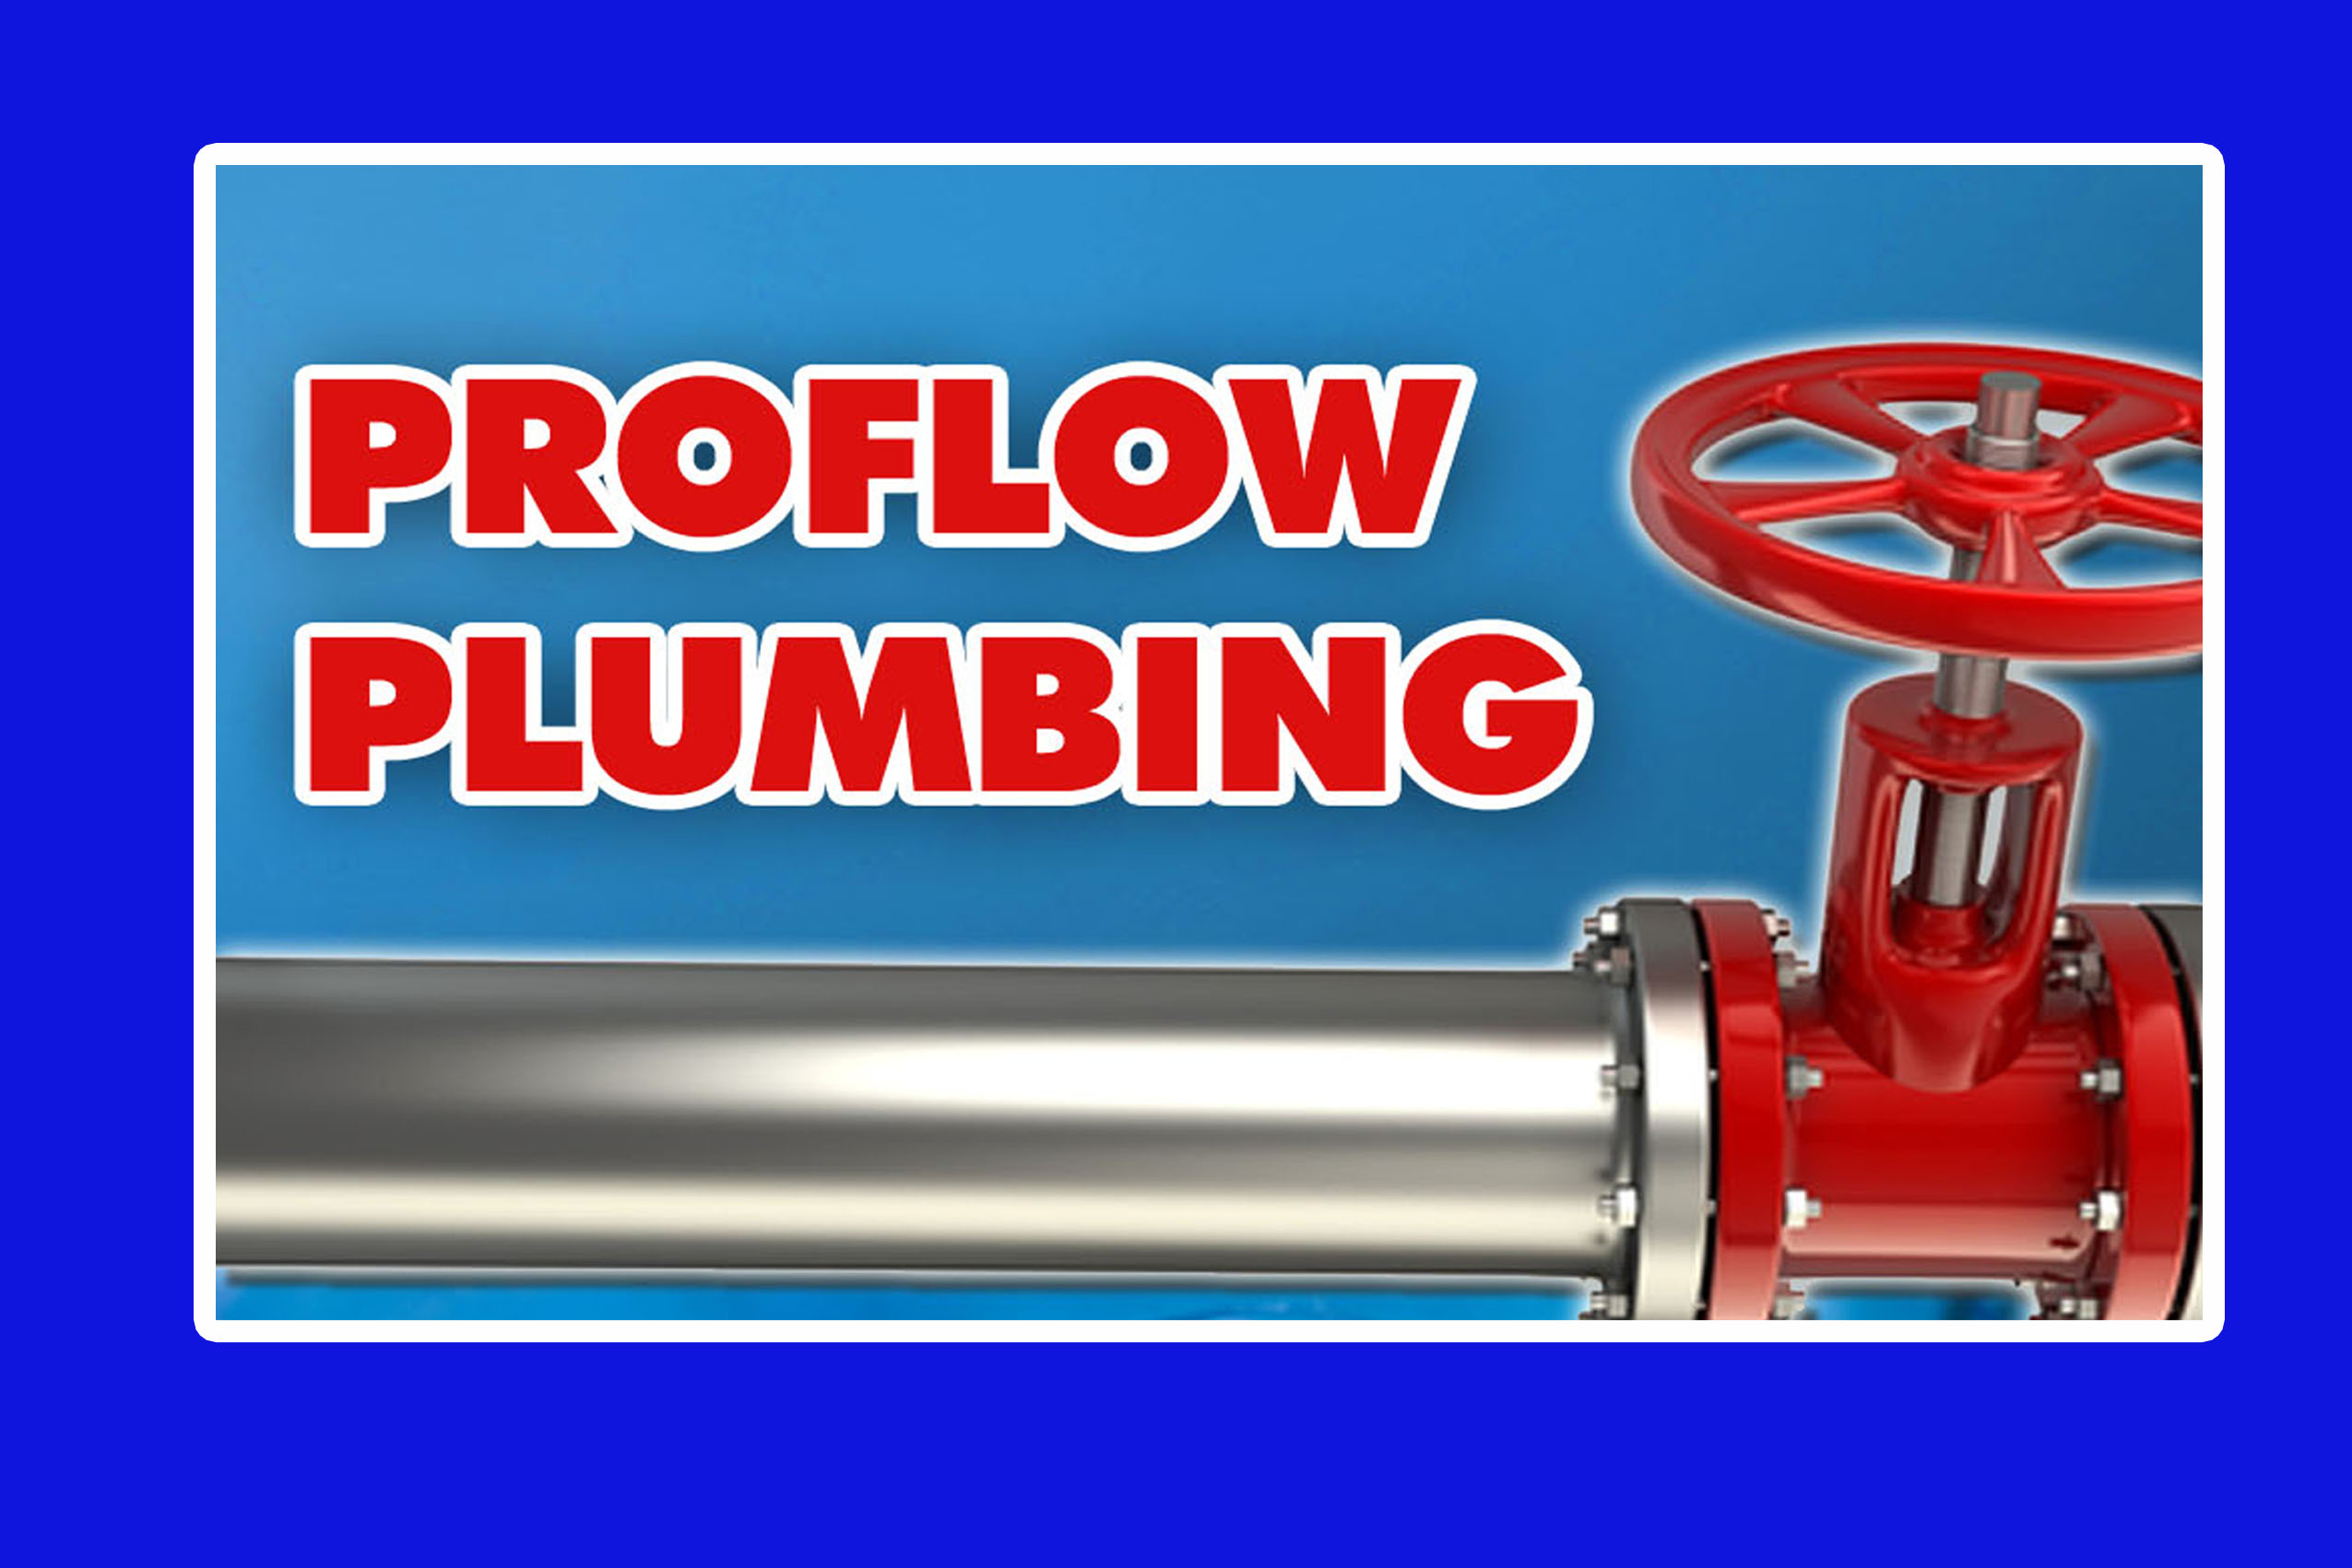 Proflow Plumbing